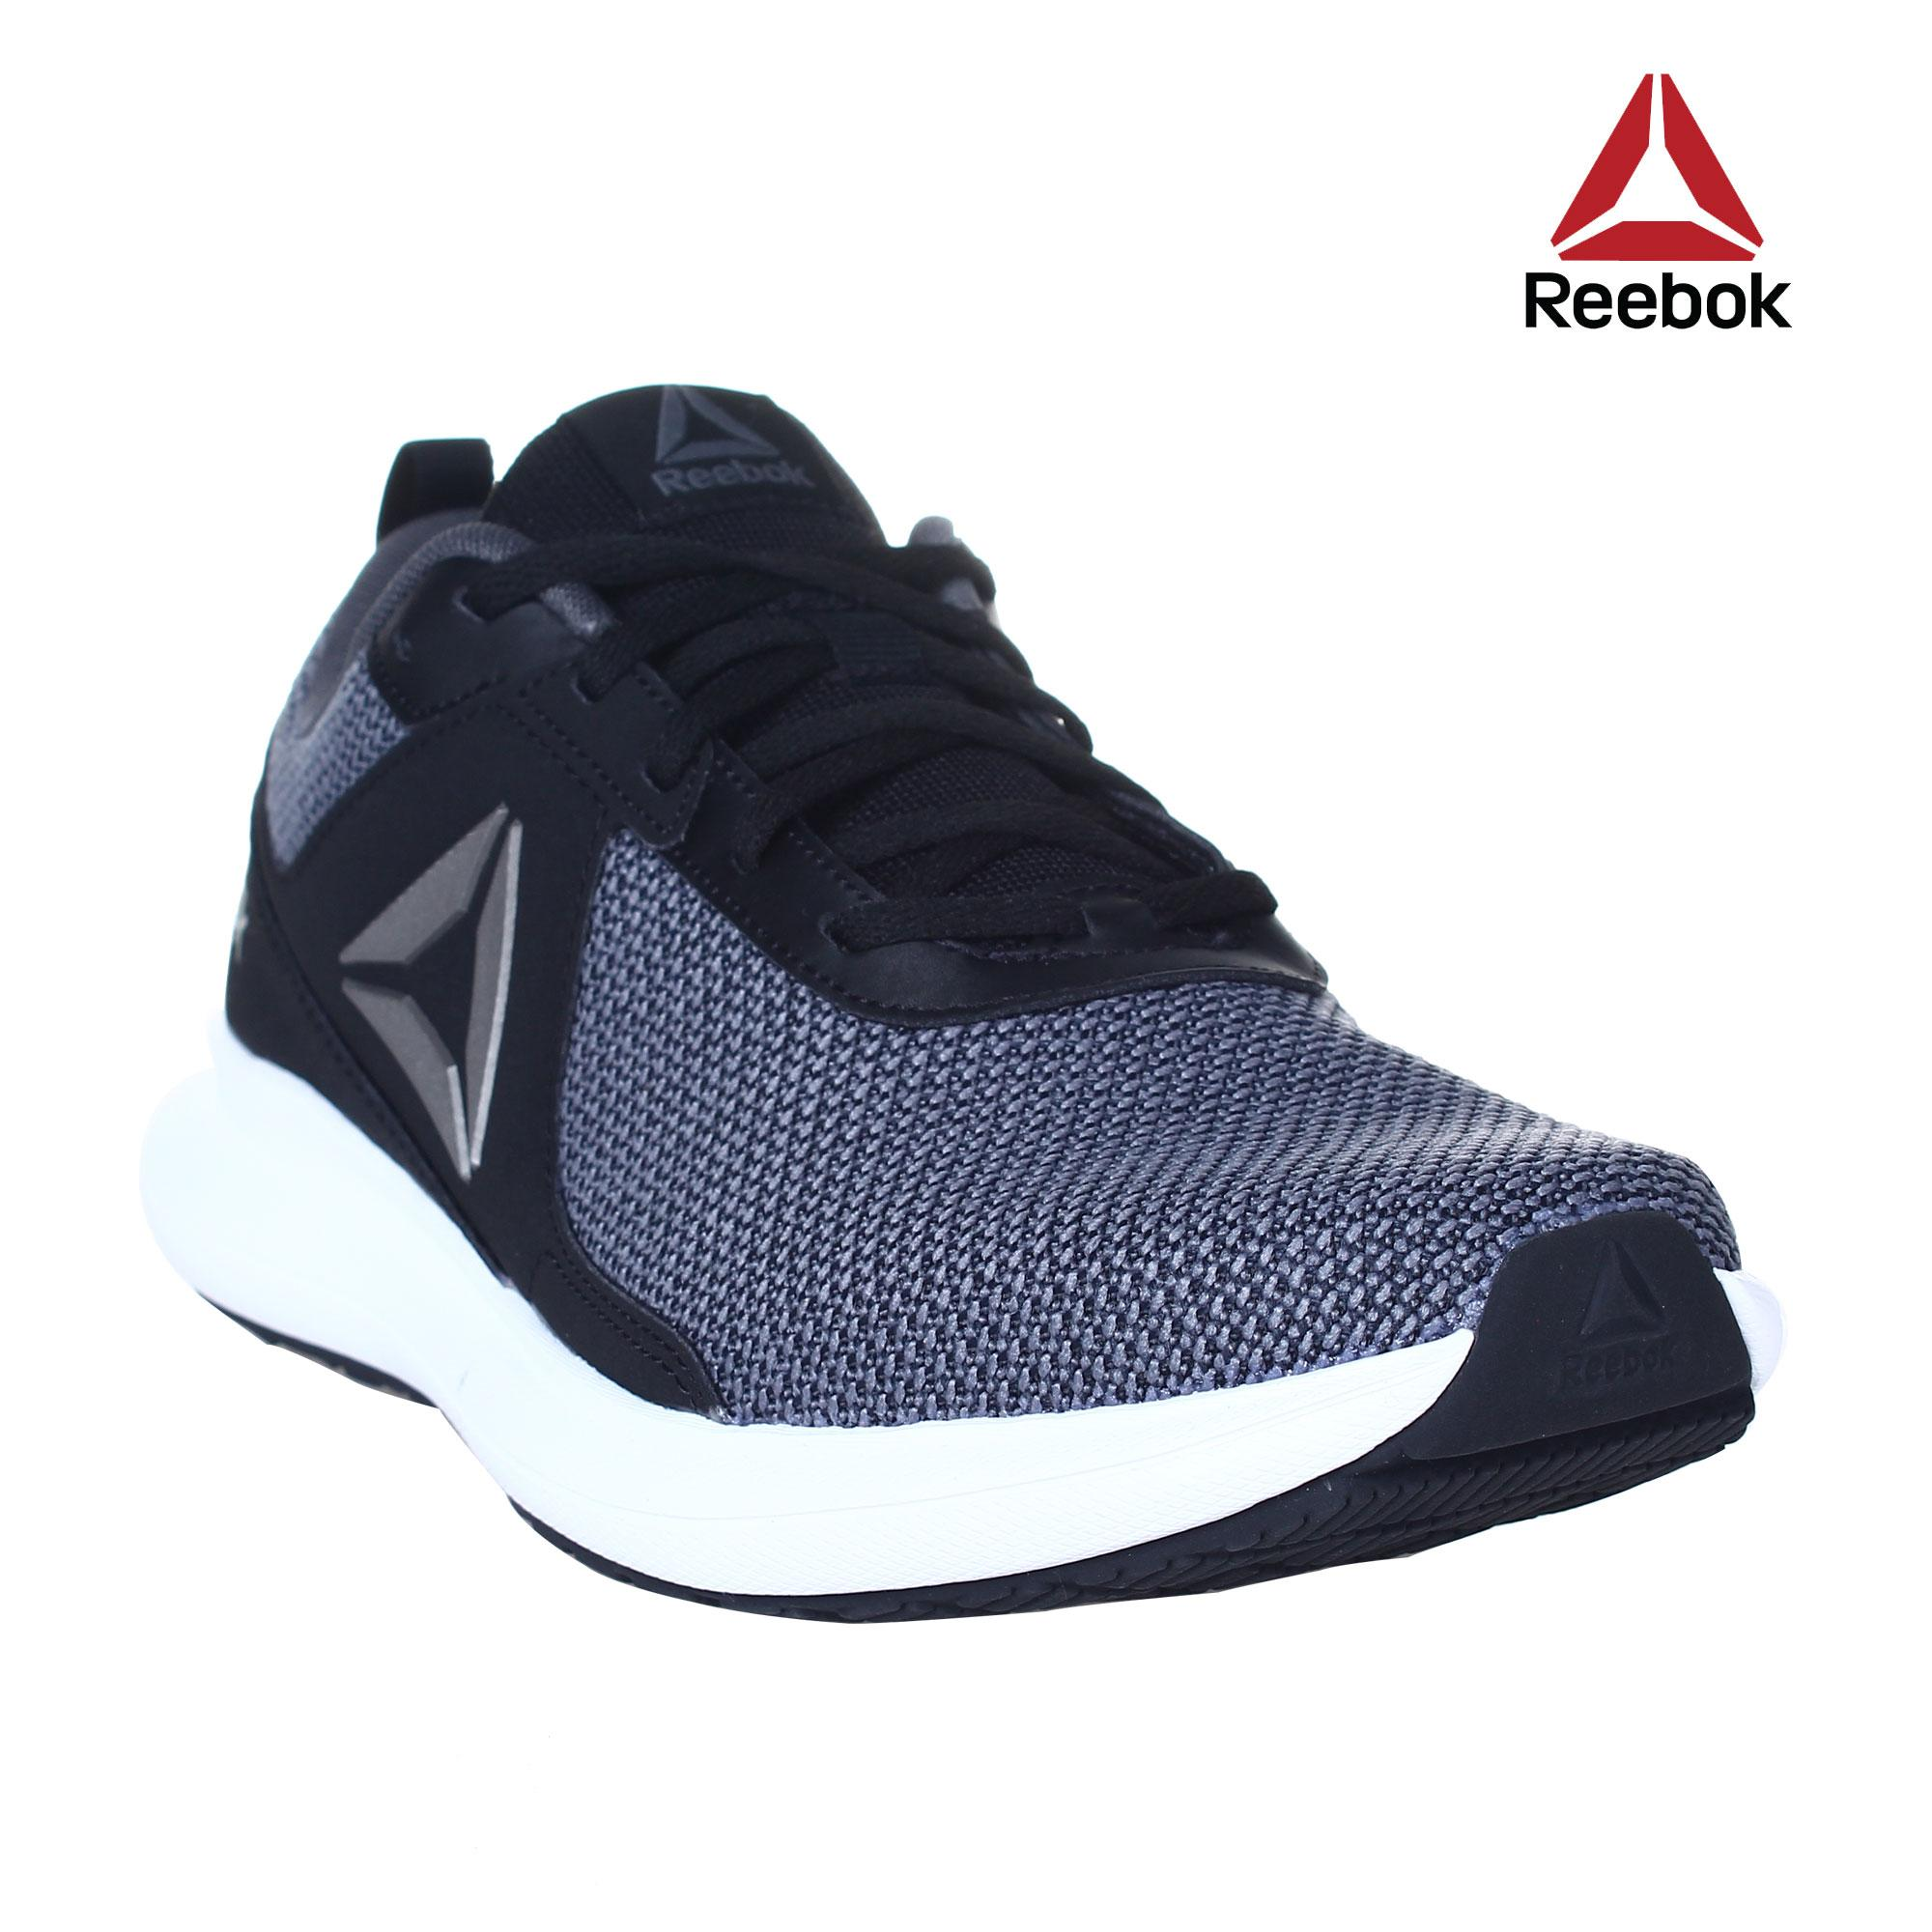 8fae49ac Reebok Philippines: Reebok price list - Shoes, Sneaker, Bag & Sports ...